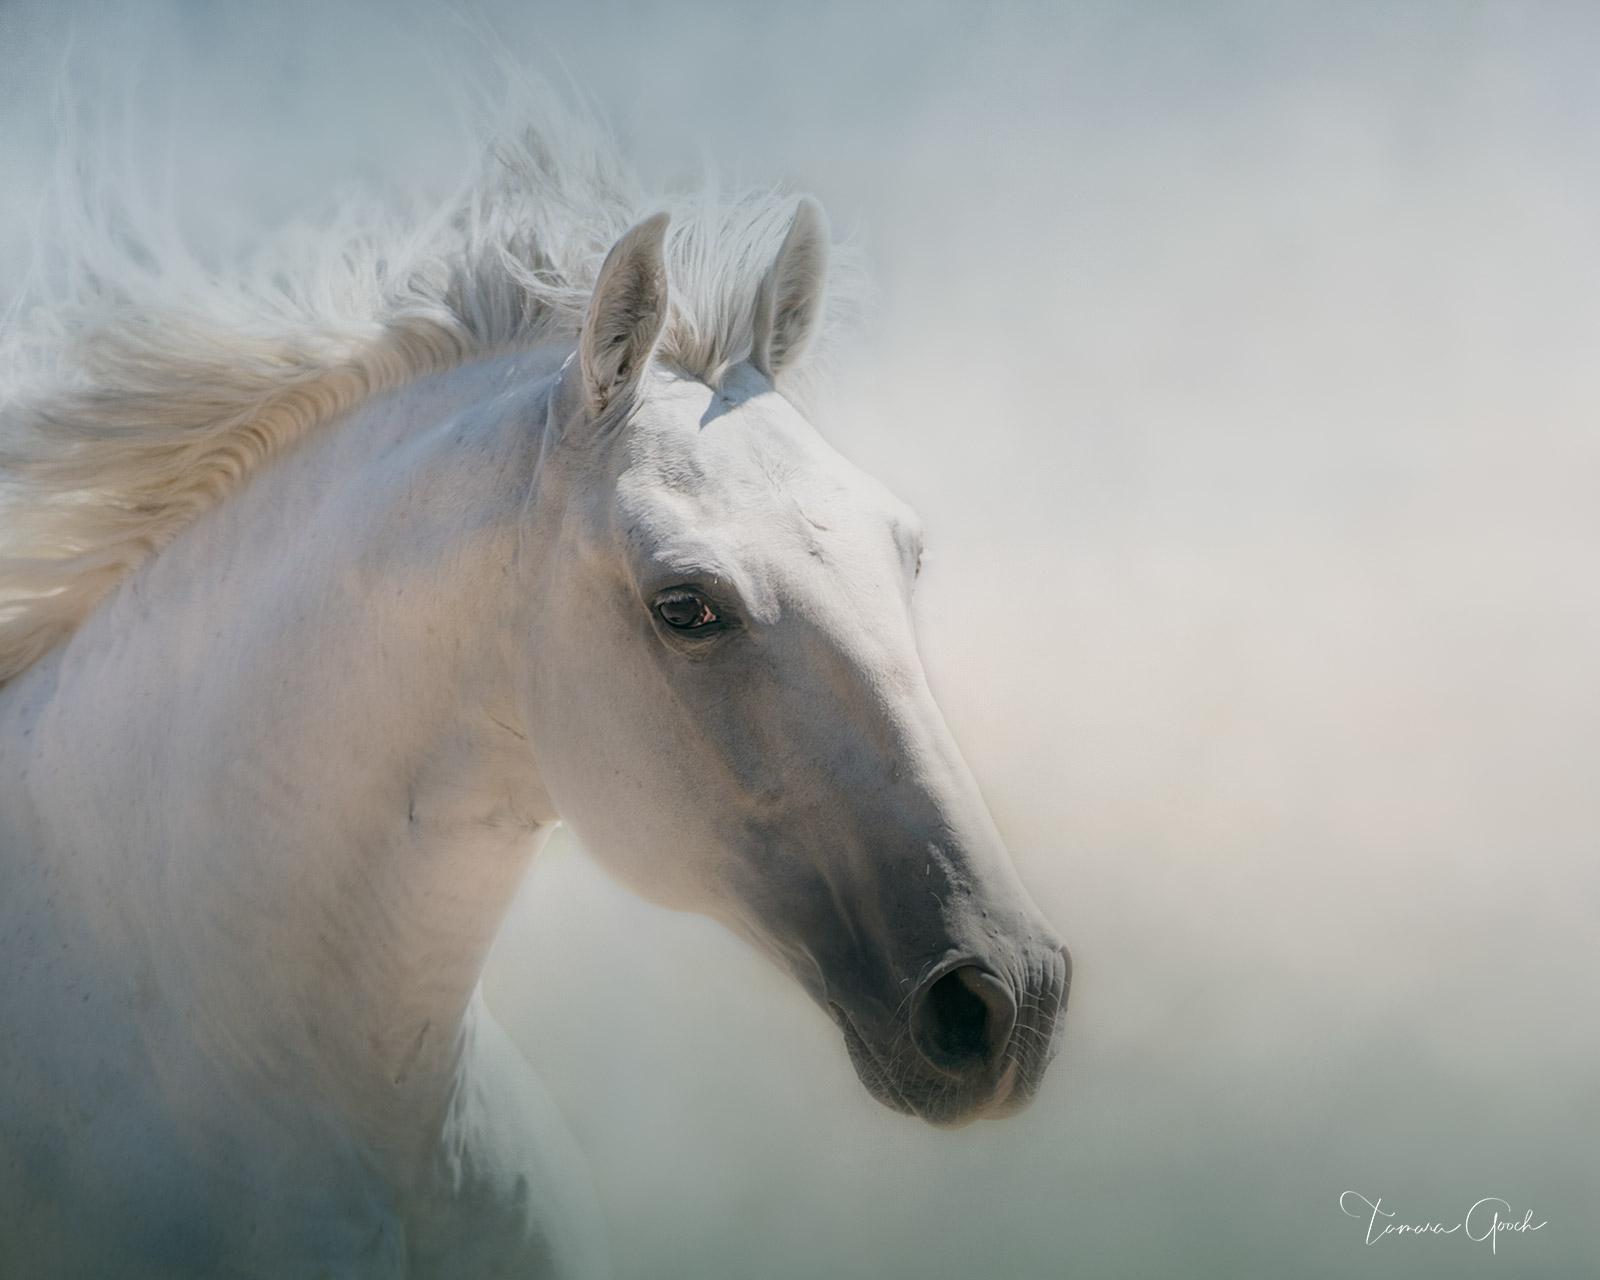 fine art photography, white, Lusitano, spanish, horse, horses, horse photos, horse photographer, horse photography, photographer, Idaho, equine, equine photography, equine photographer, Idaho equine p, photo